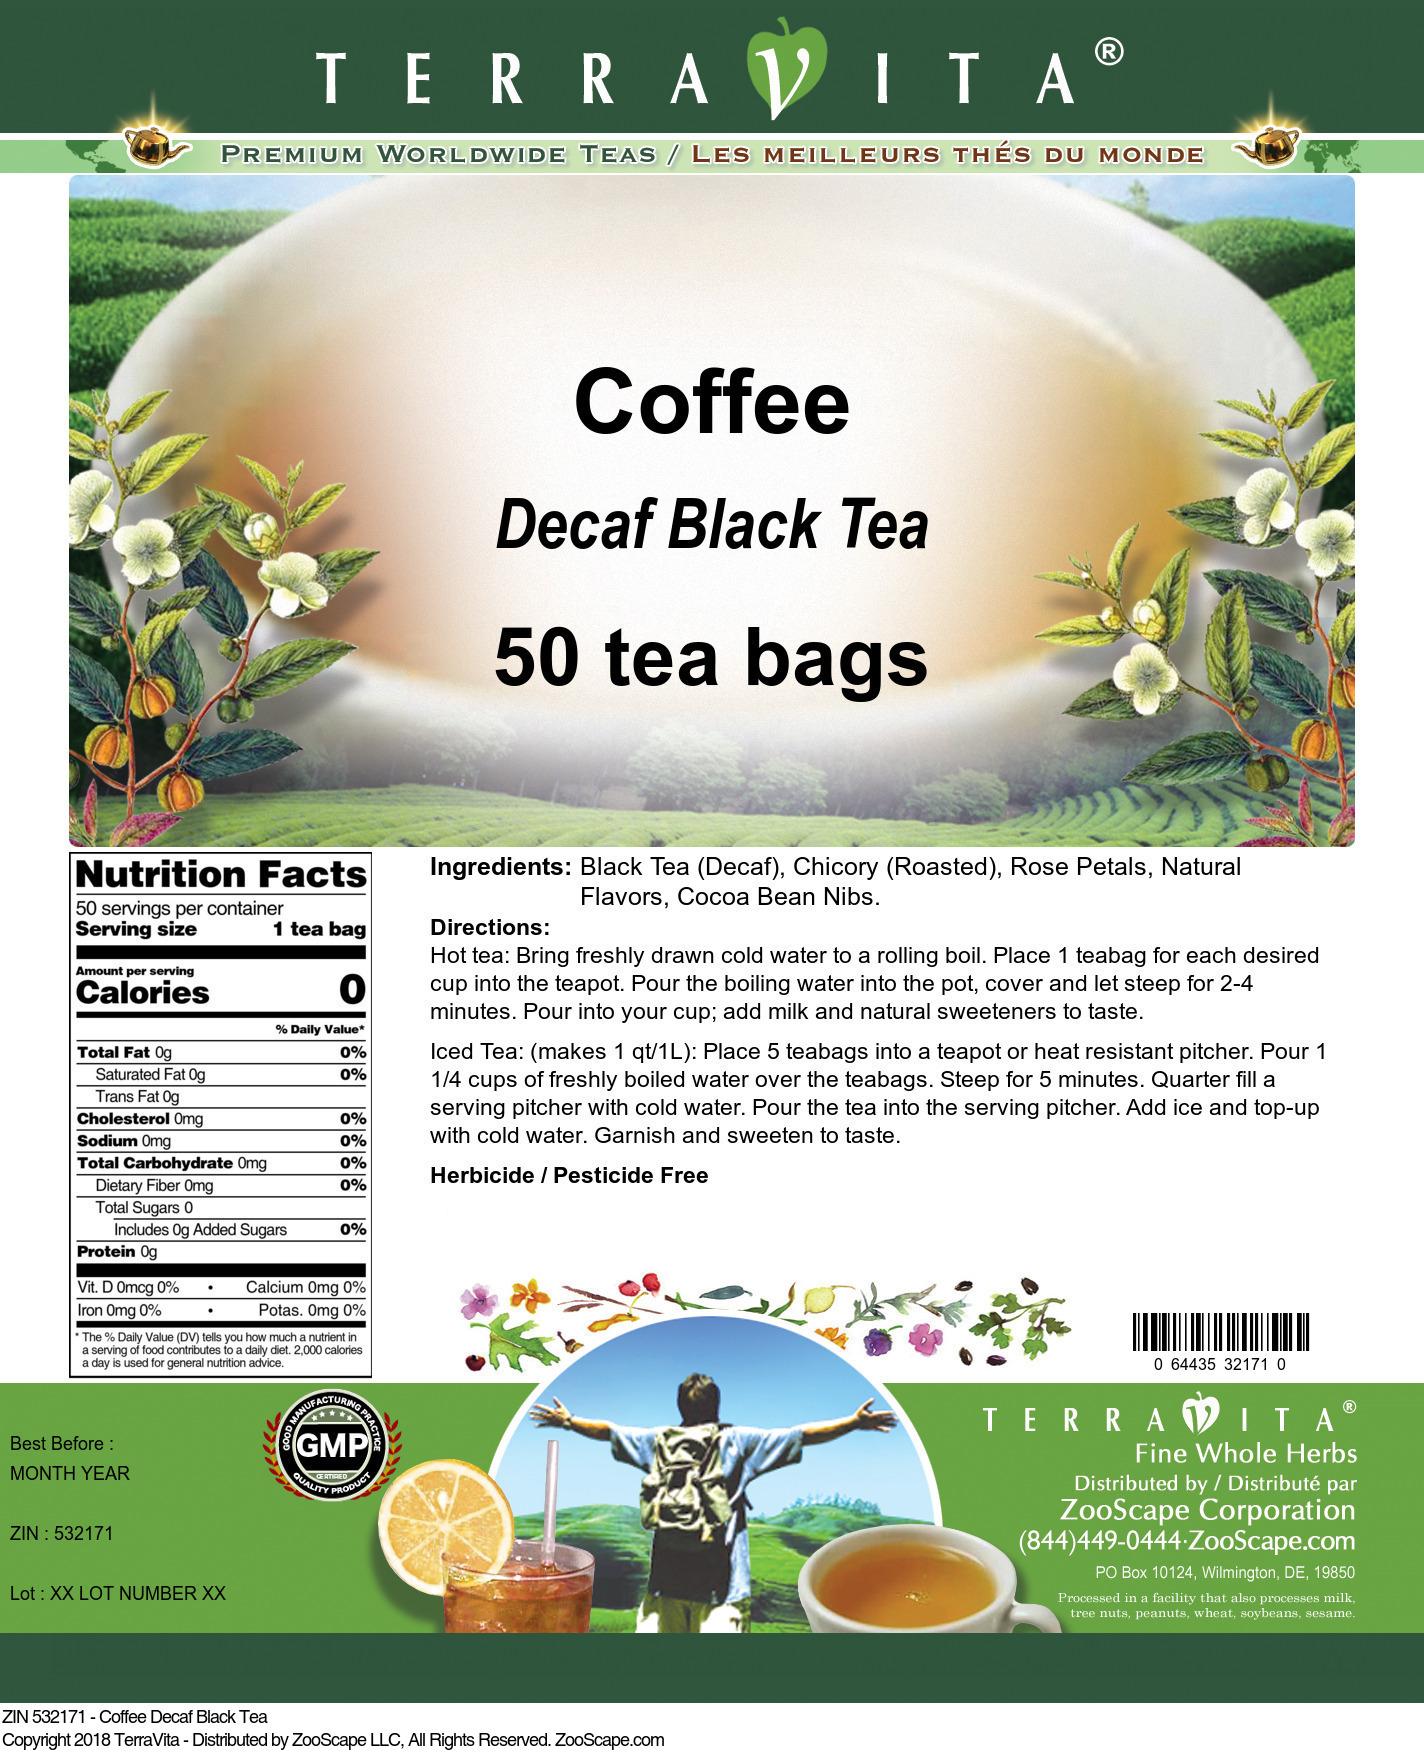 Coffee Decaf Black Tea